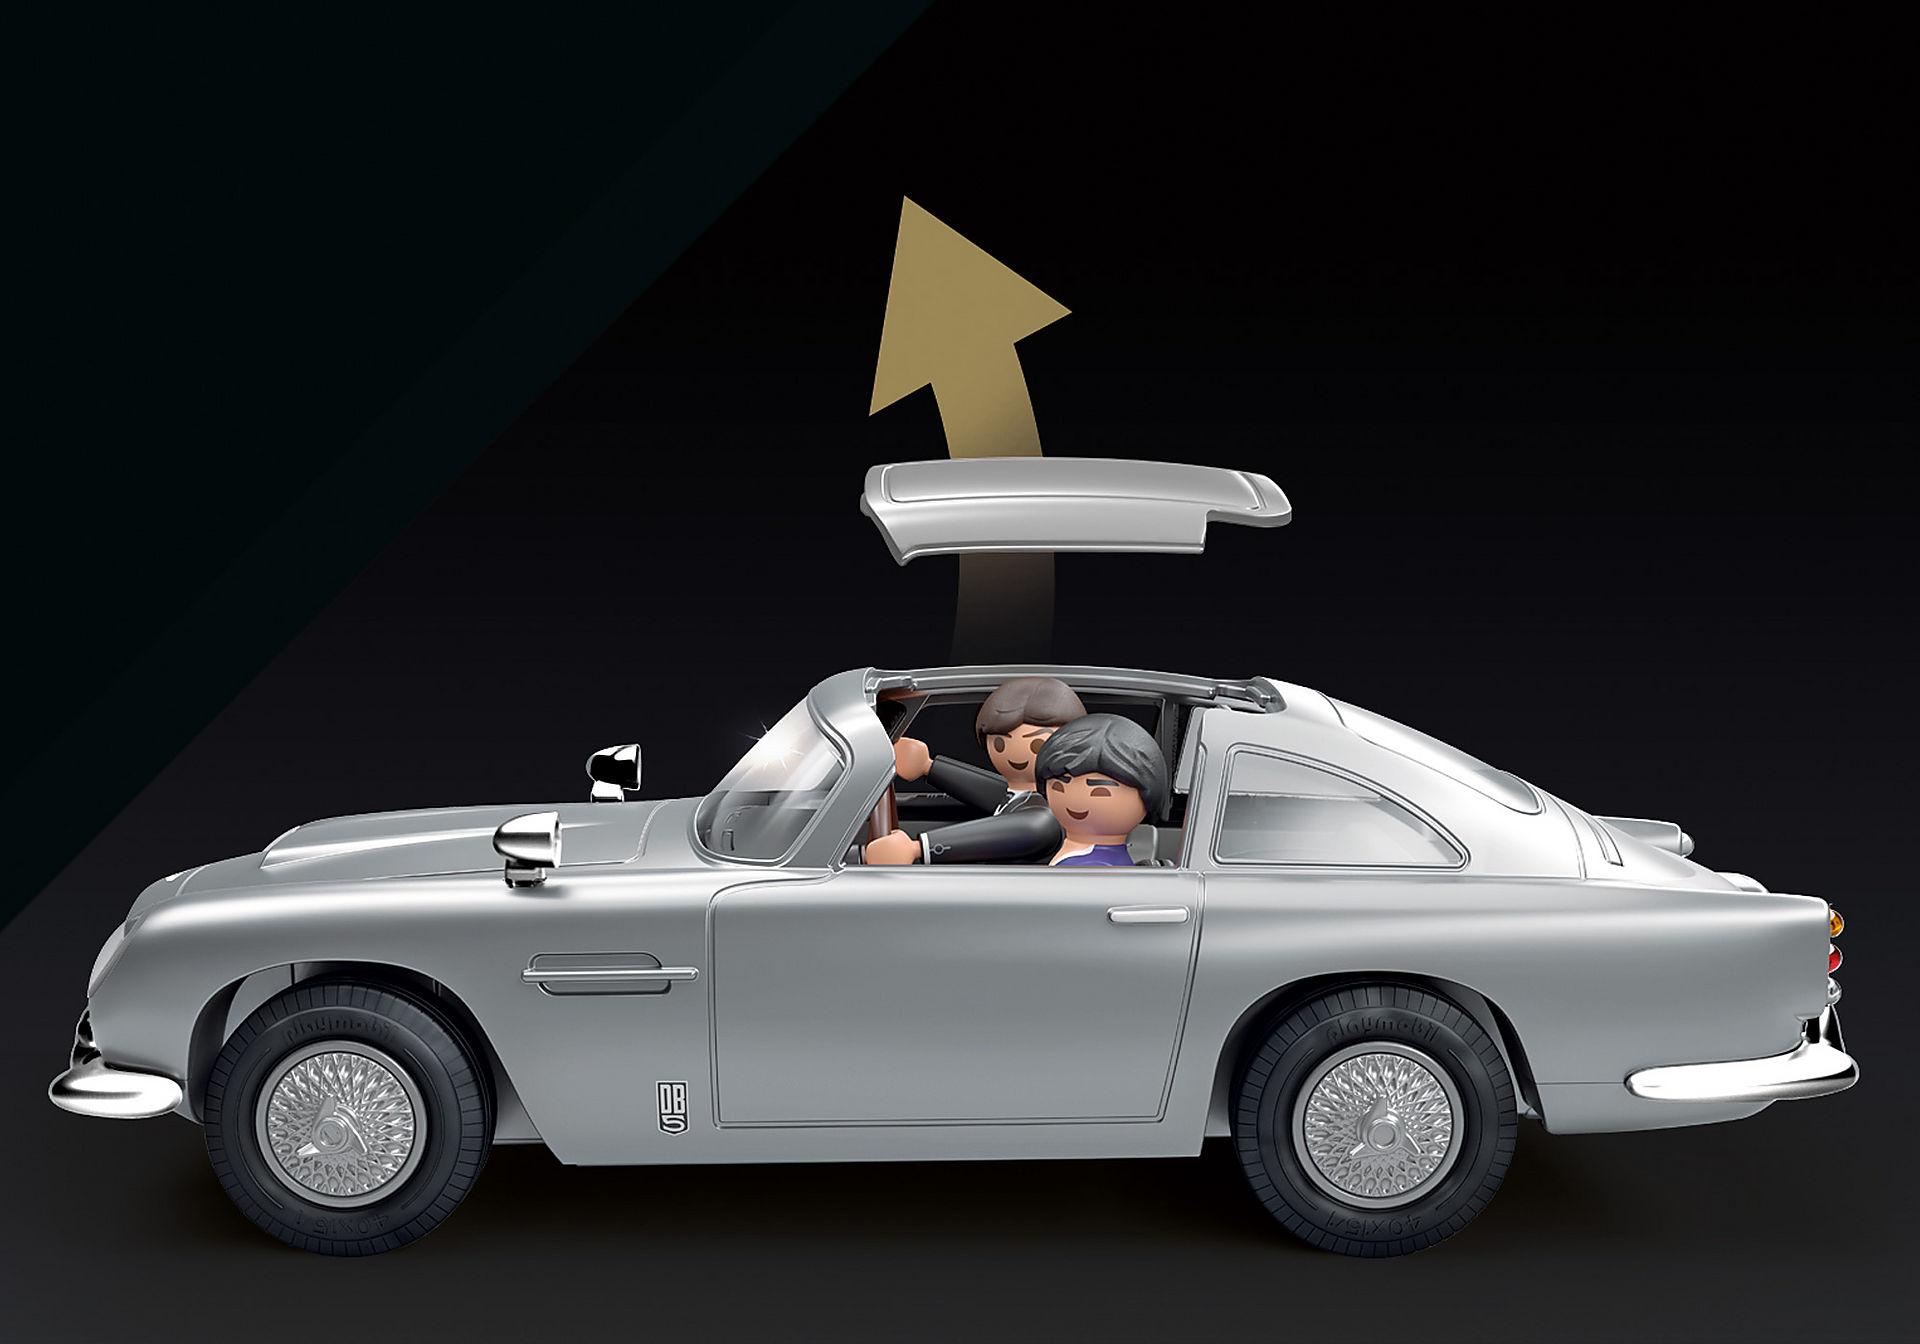 70578 James Bond Aston Martin DB5 - Edition Goldfinger zoom image4